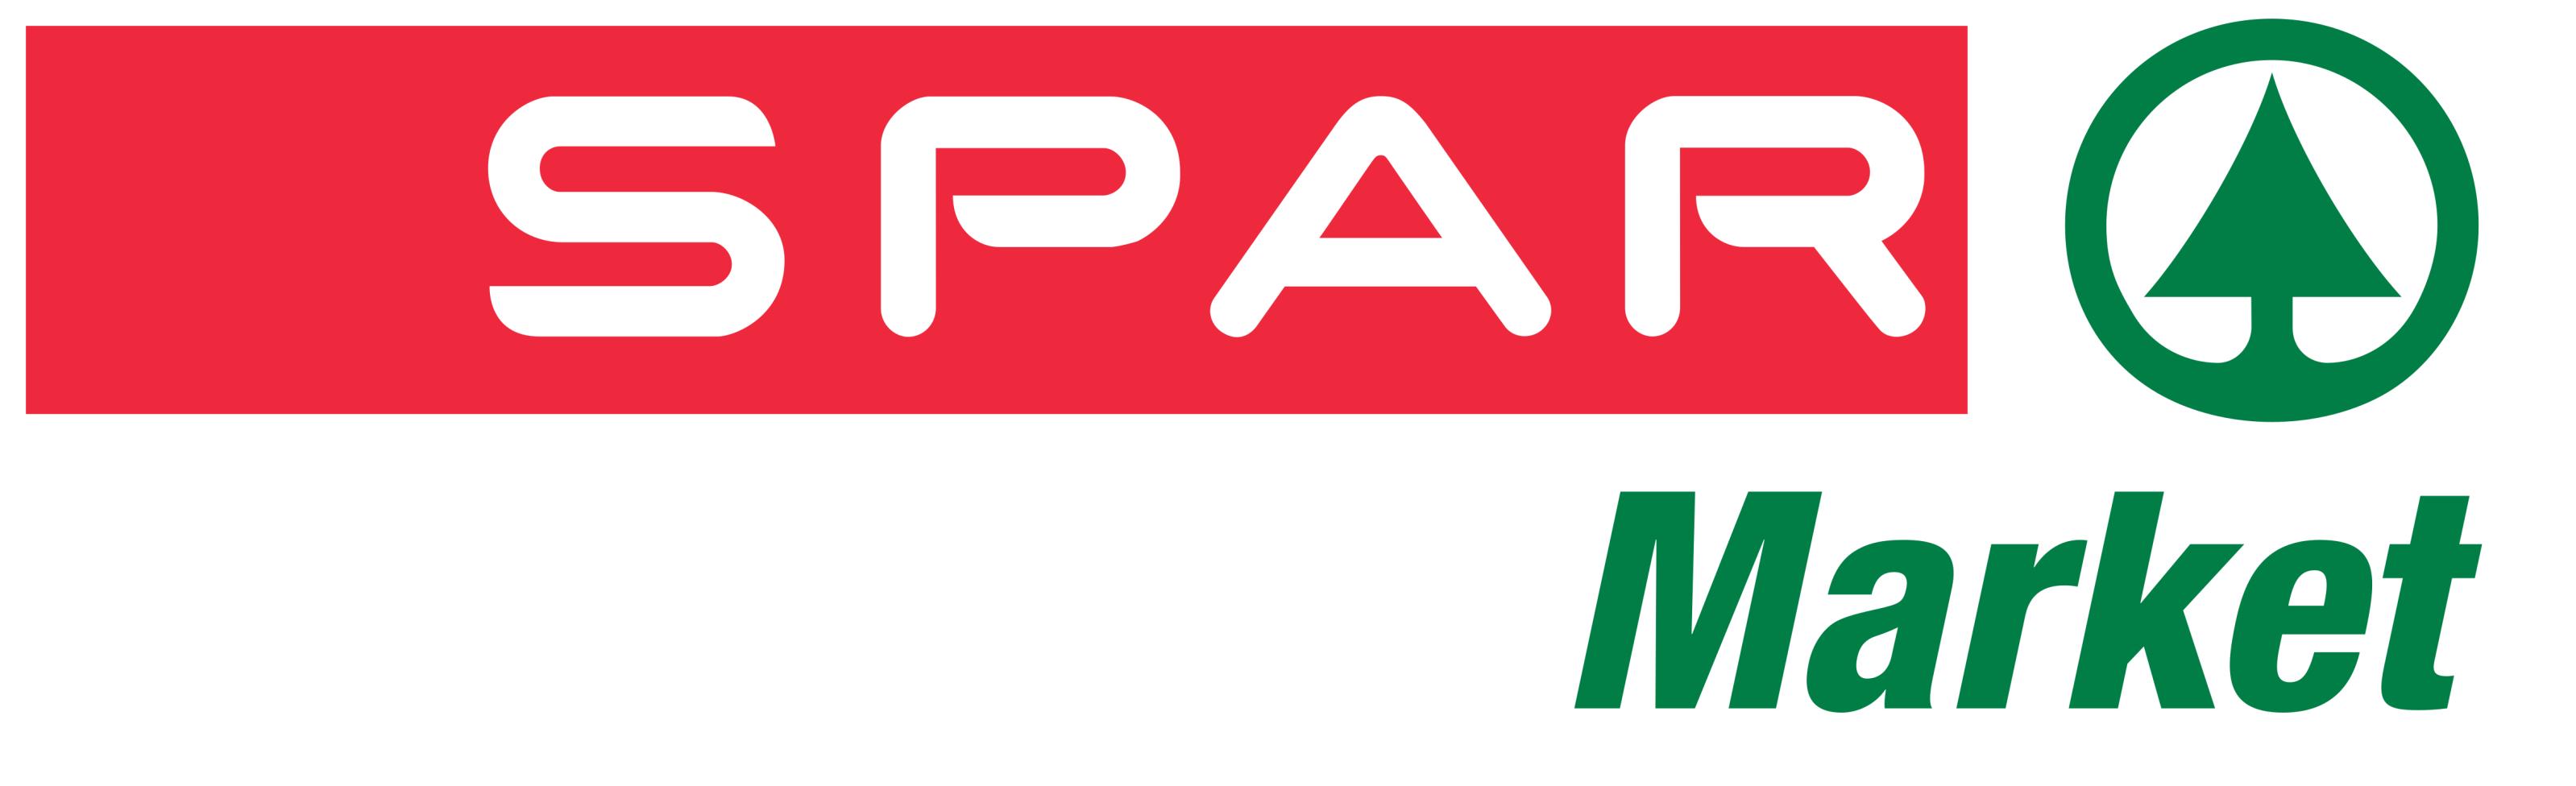 Spar Market Nigeria